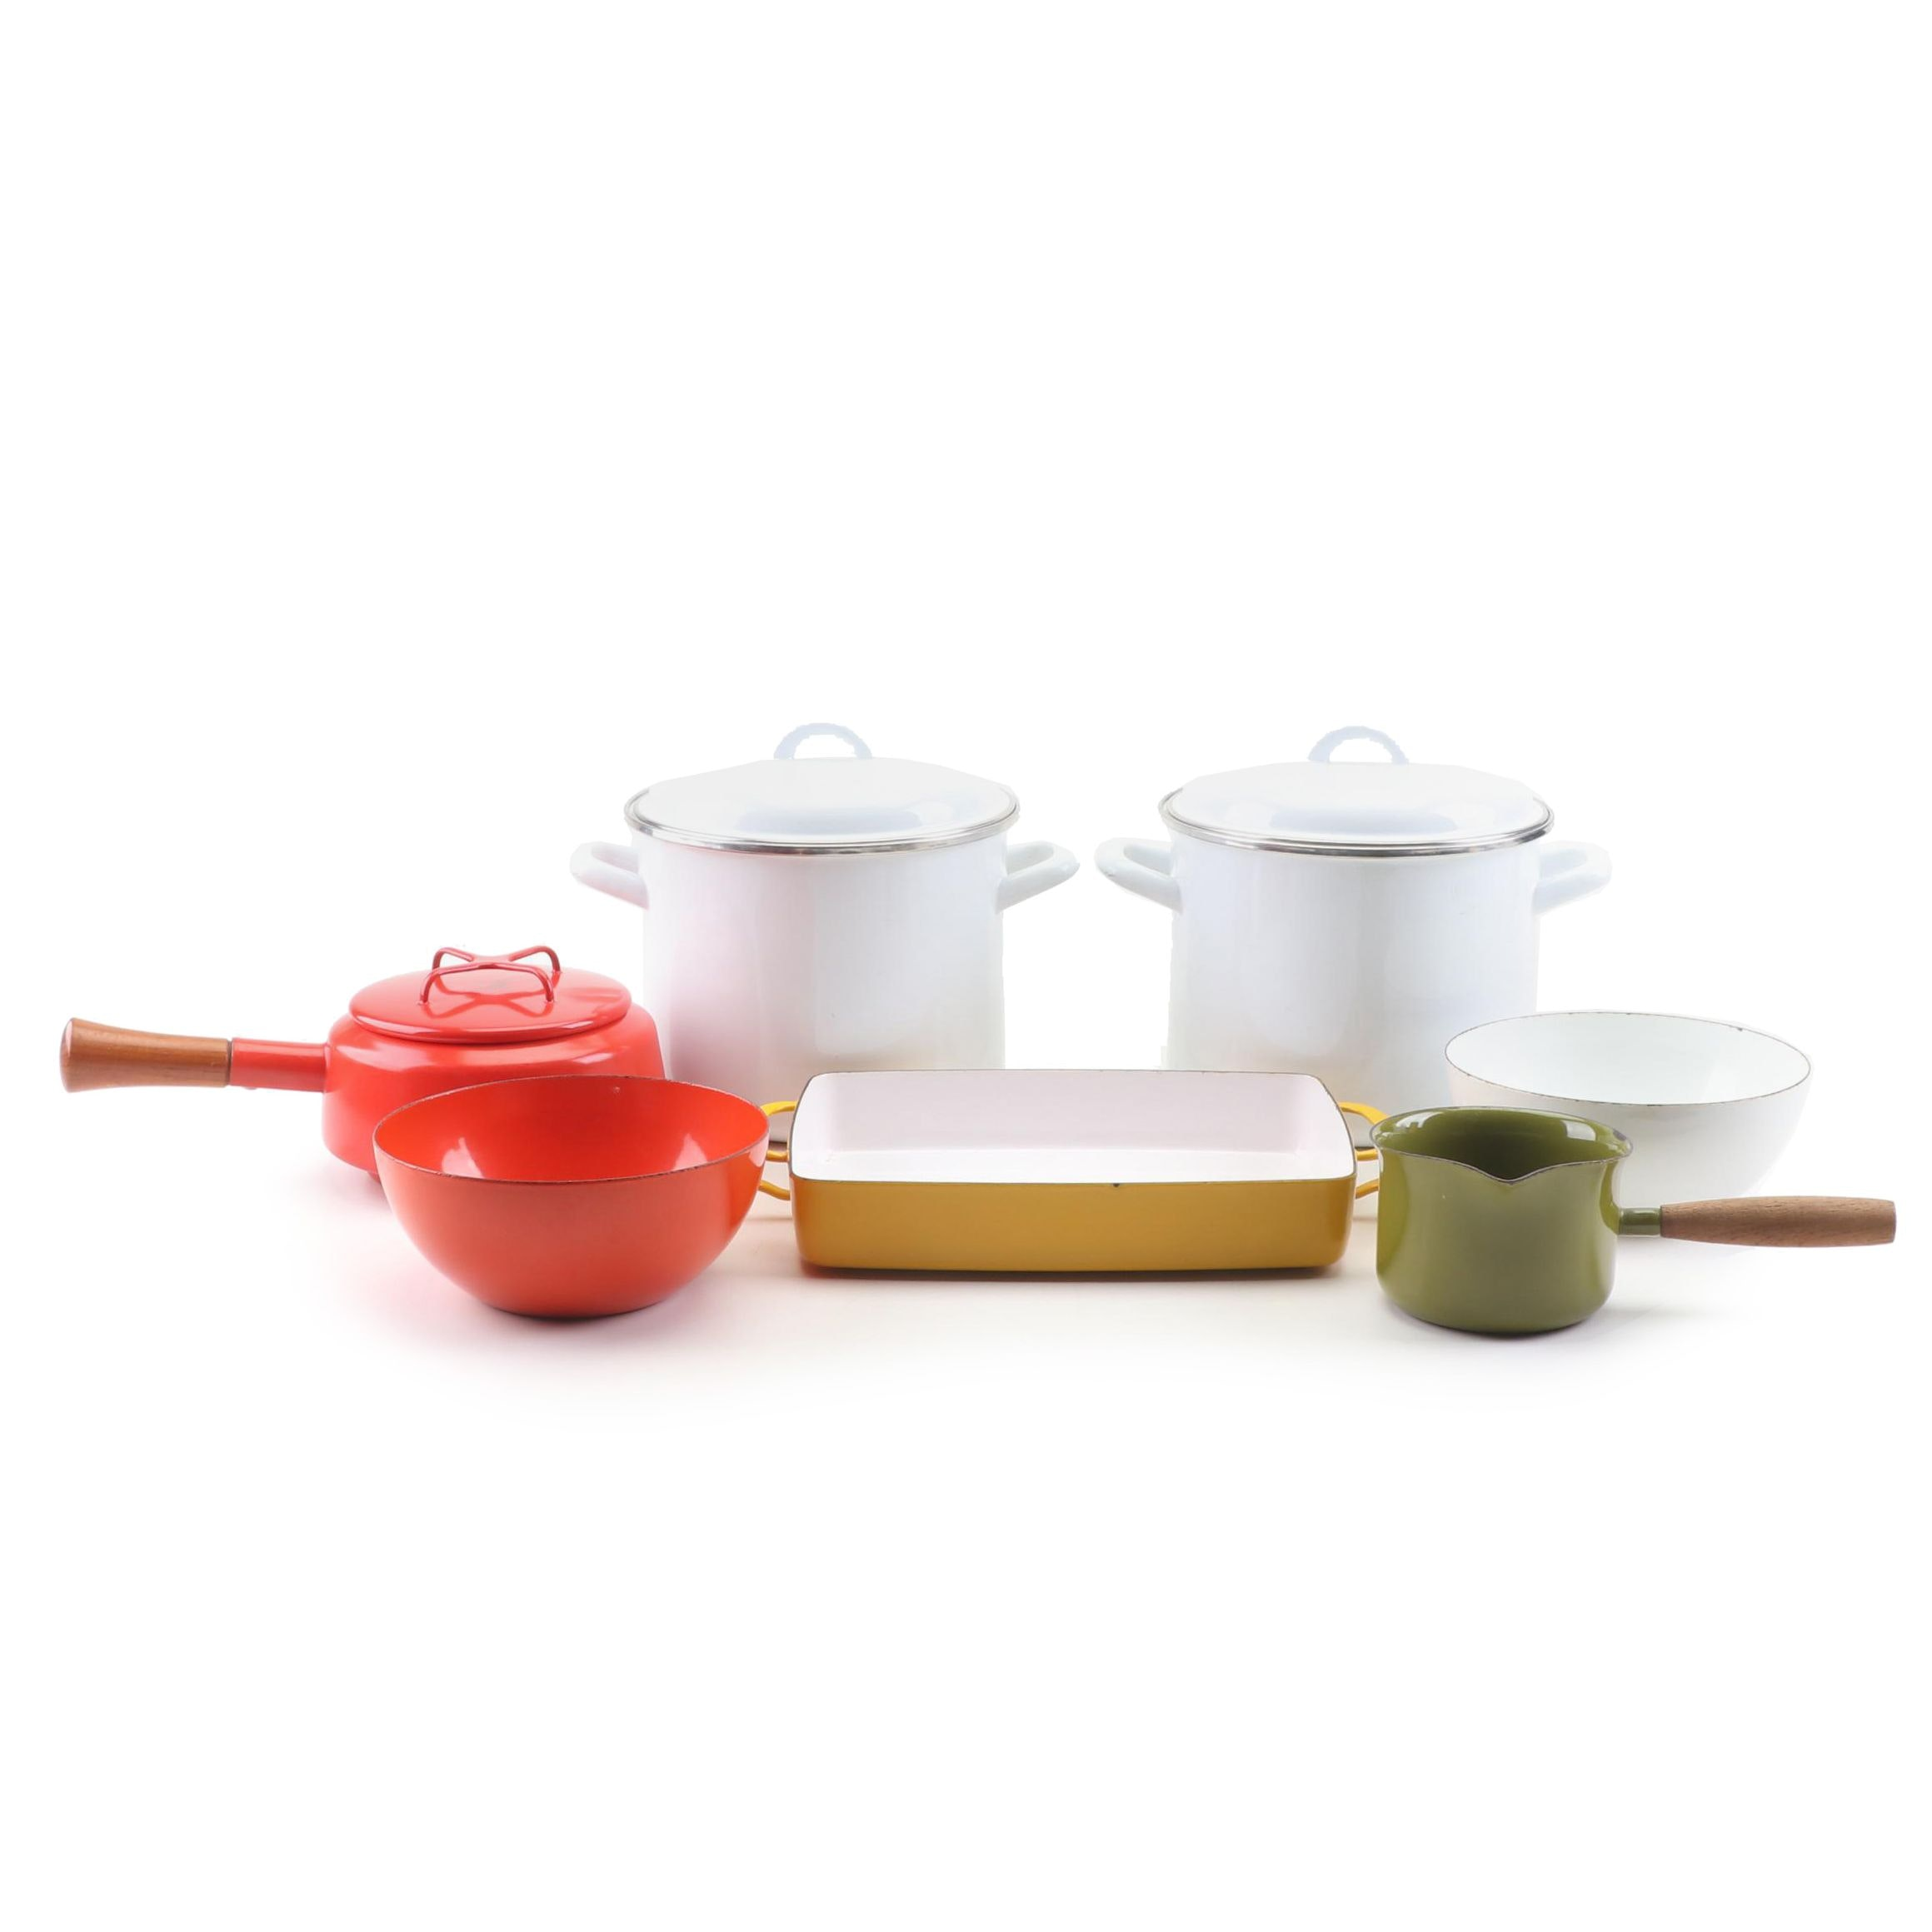 Vintage San Ignacio Enamel Cookware Set